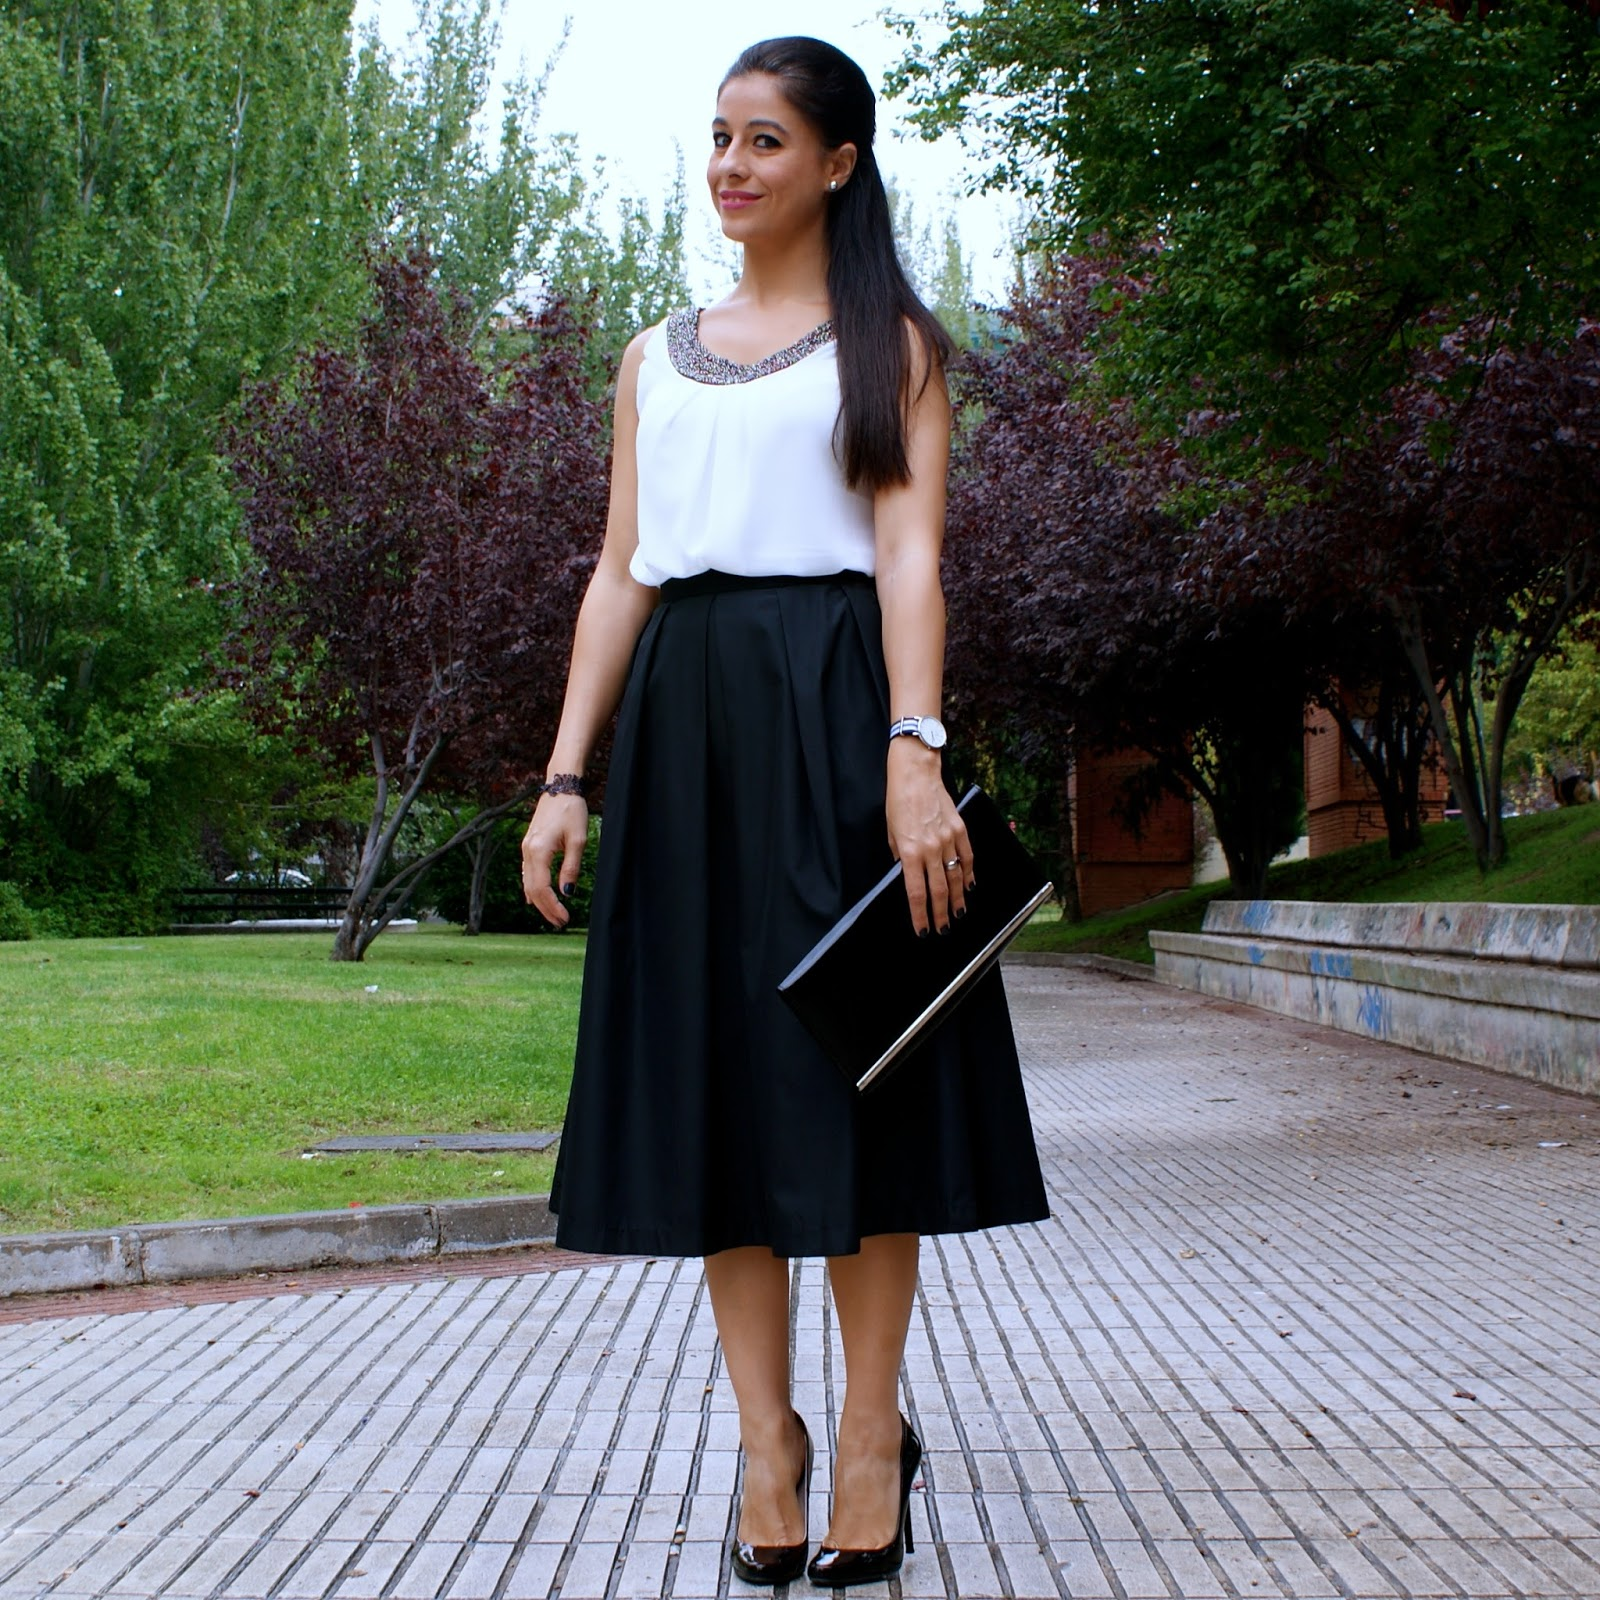 49 Faldas Largas de Moda para que luzcas con Estilo (2020)